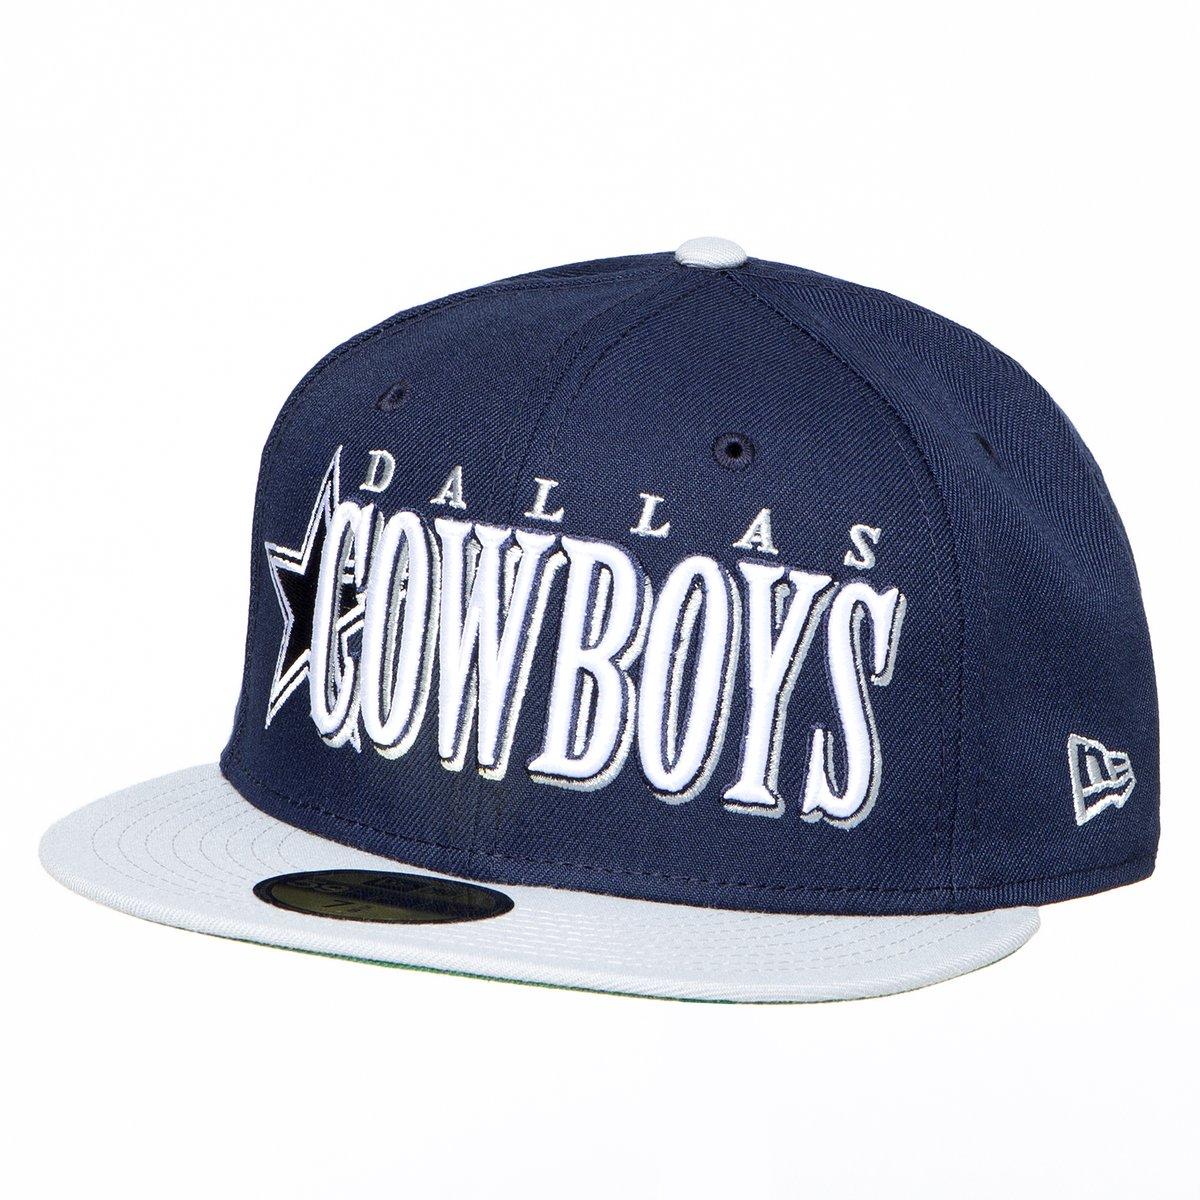 🚨 NEW GEAR ALERT! 🚨 Some fresh #CowboysNation styles from @NewEraCap just hit our website! Get yours now: https://t.co/KaZa9jtyfJ https://t.co/VPSJNn7SiX